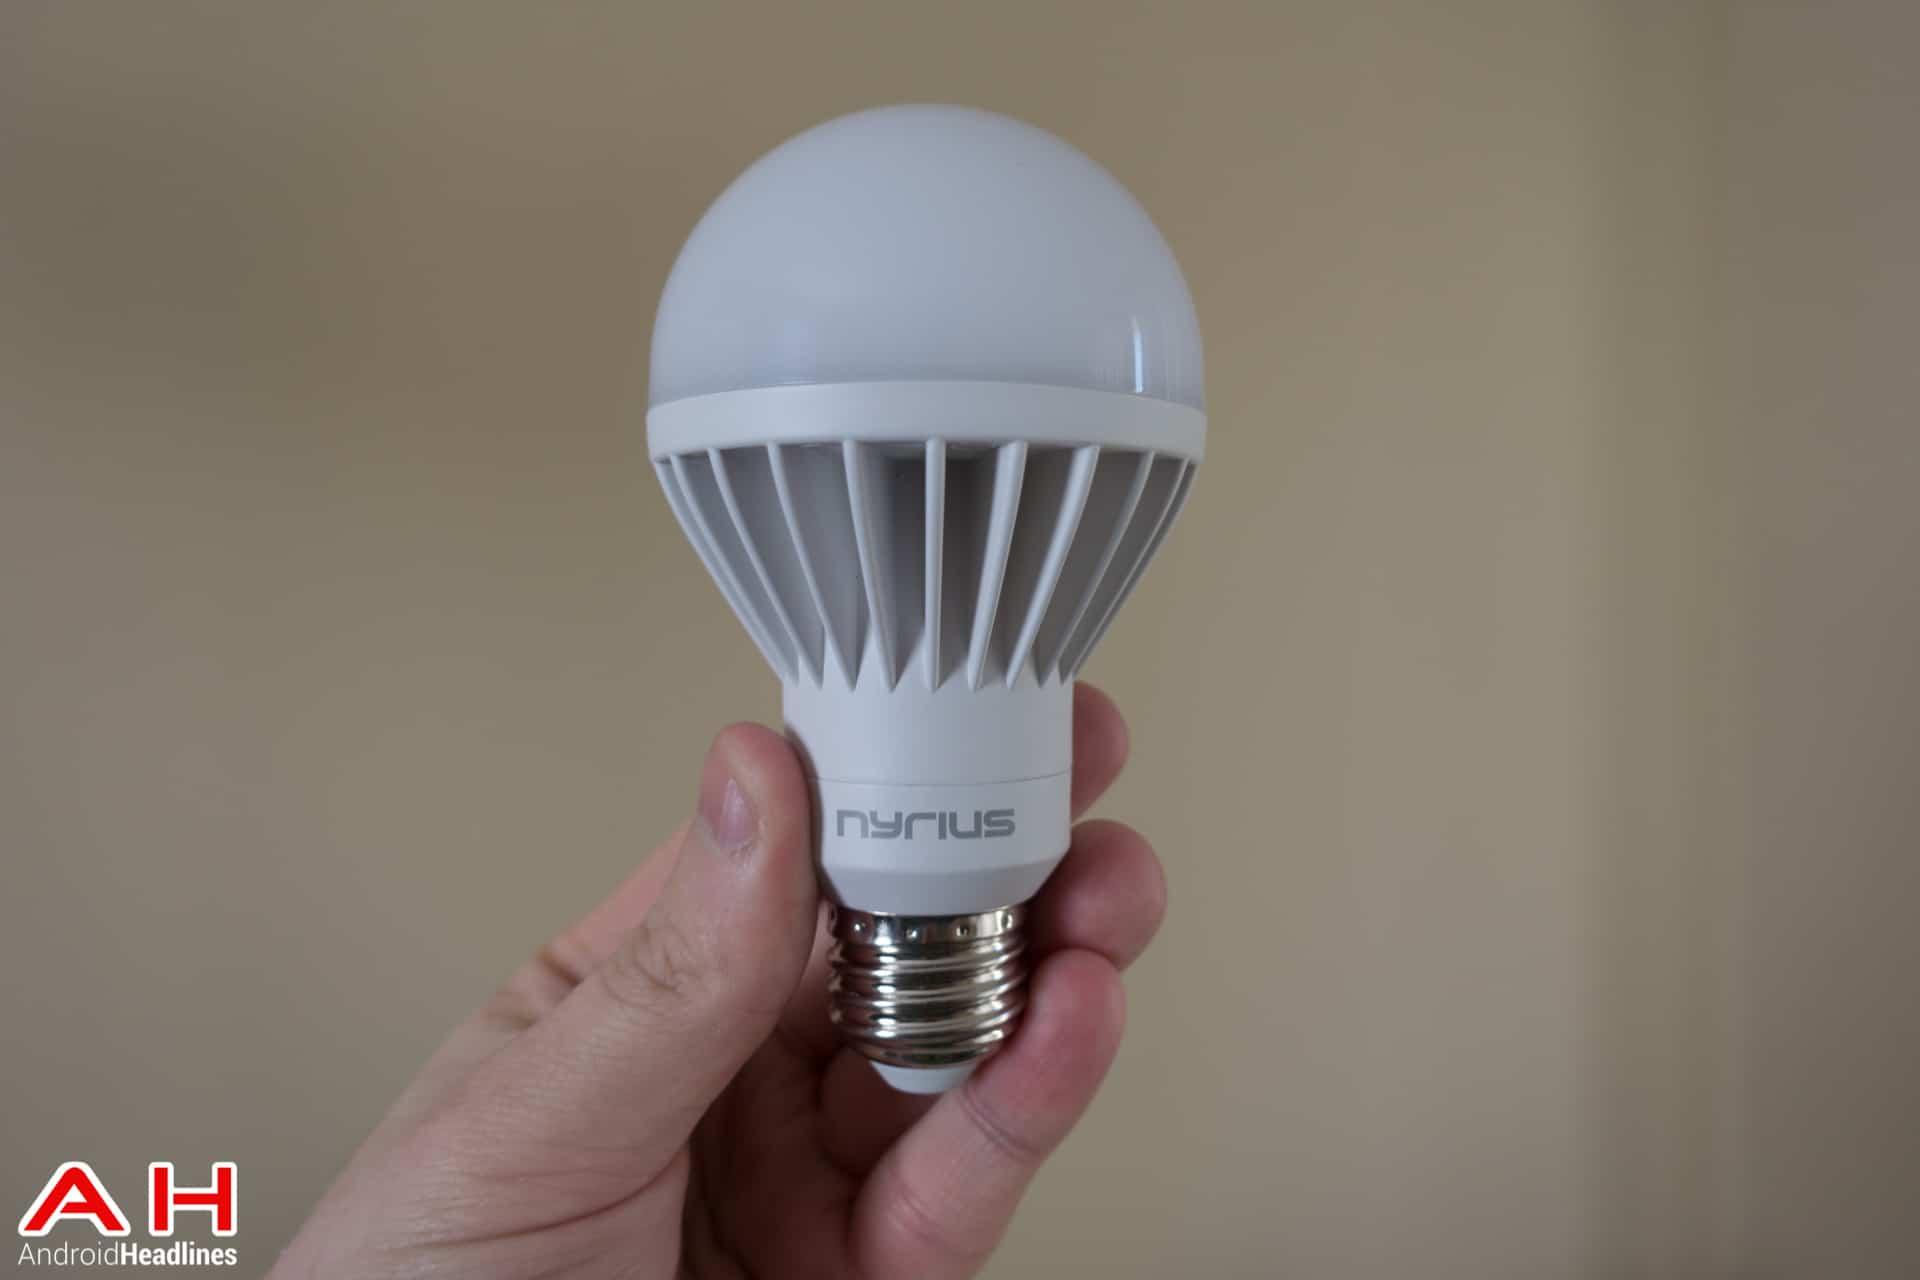 Nyrius Smart LED Bulb AH 3